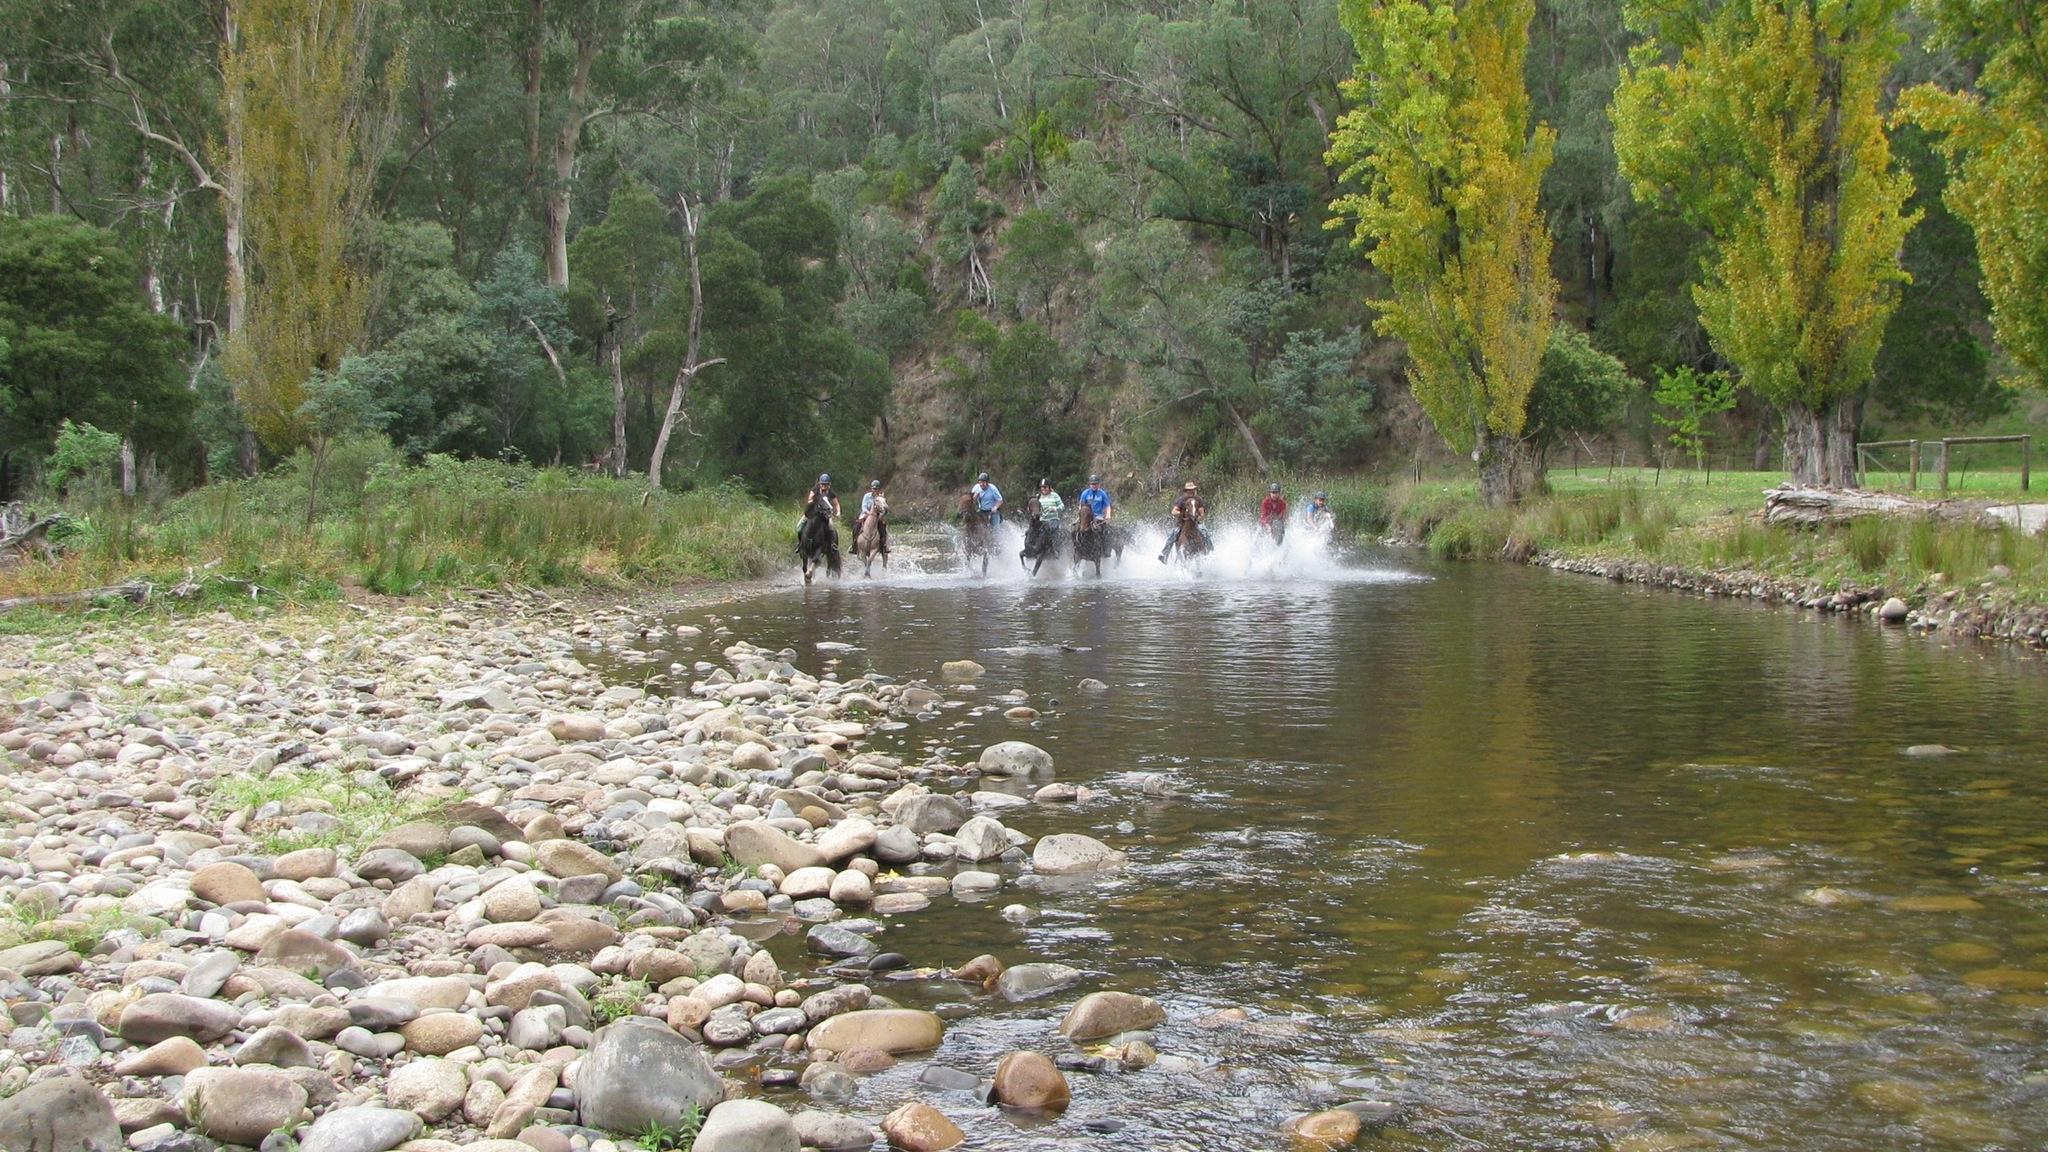 fun in the river at Sheepyard